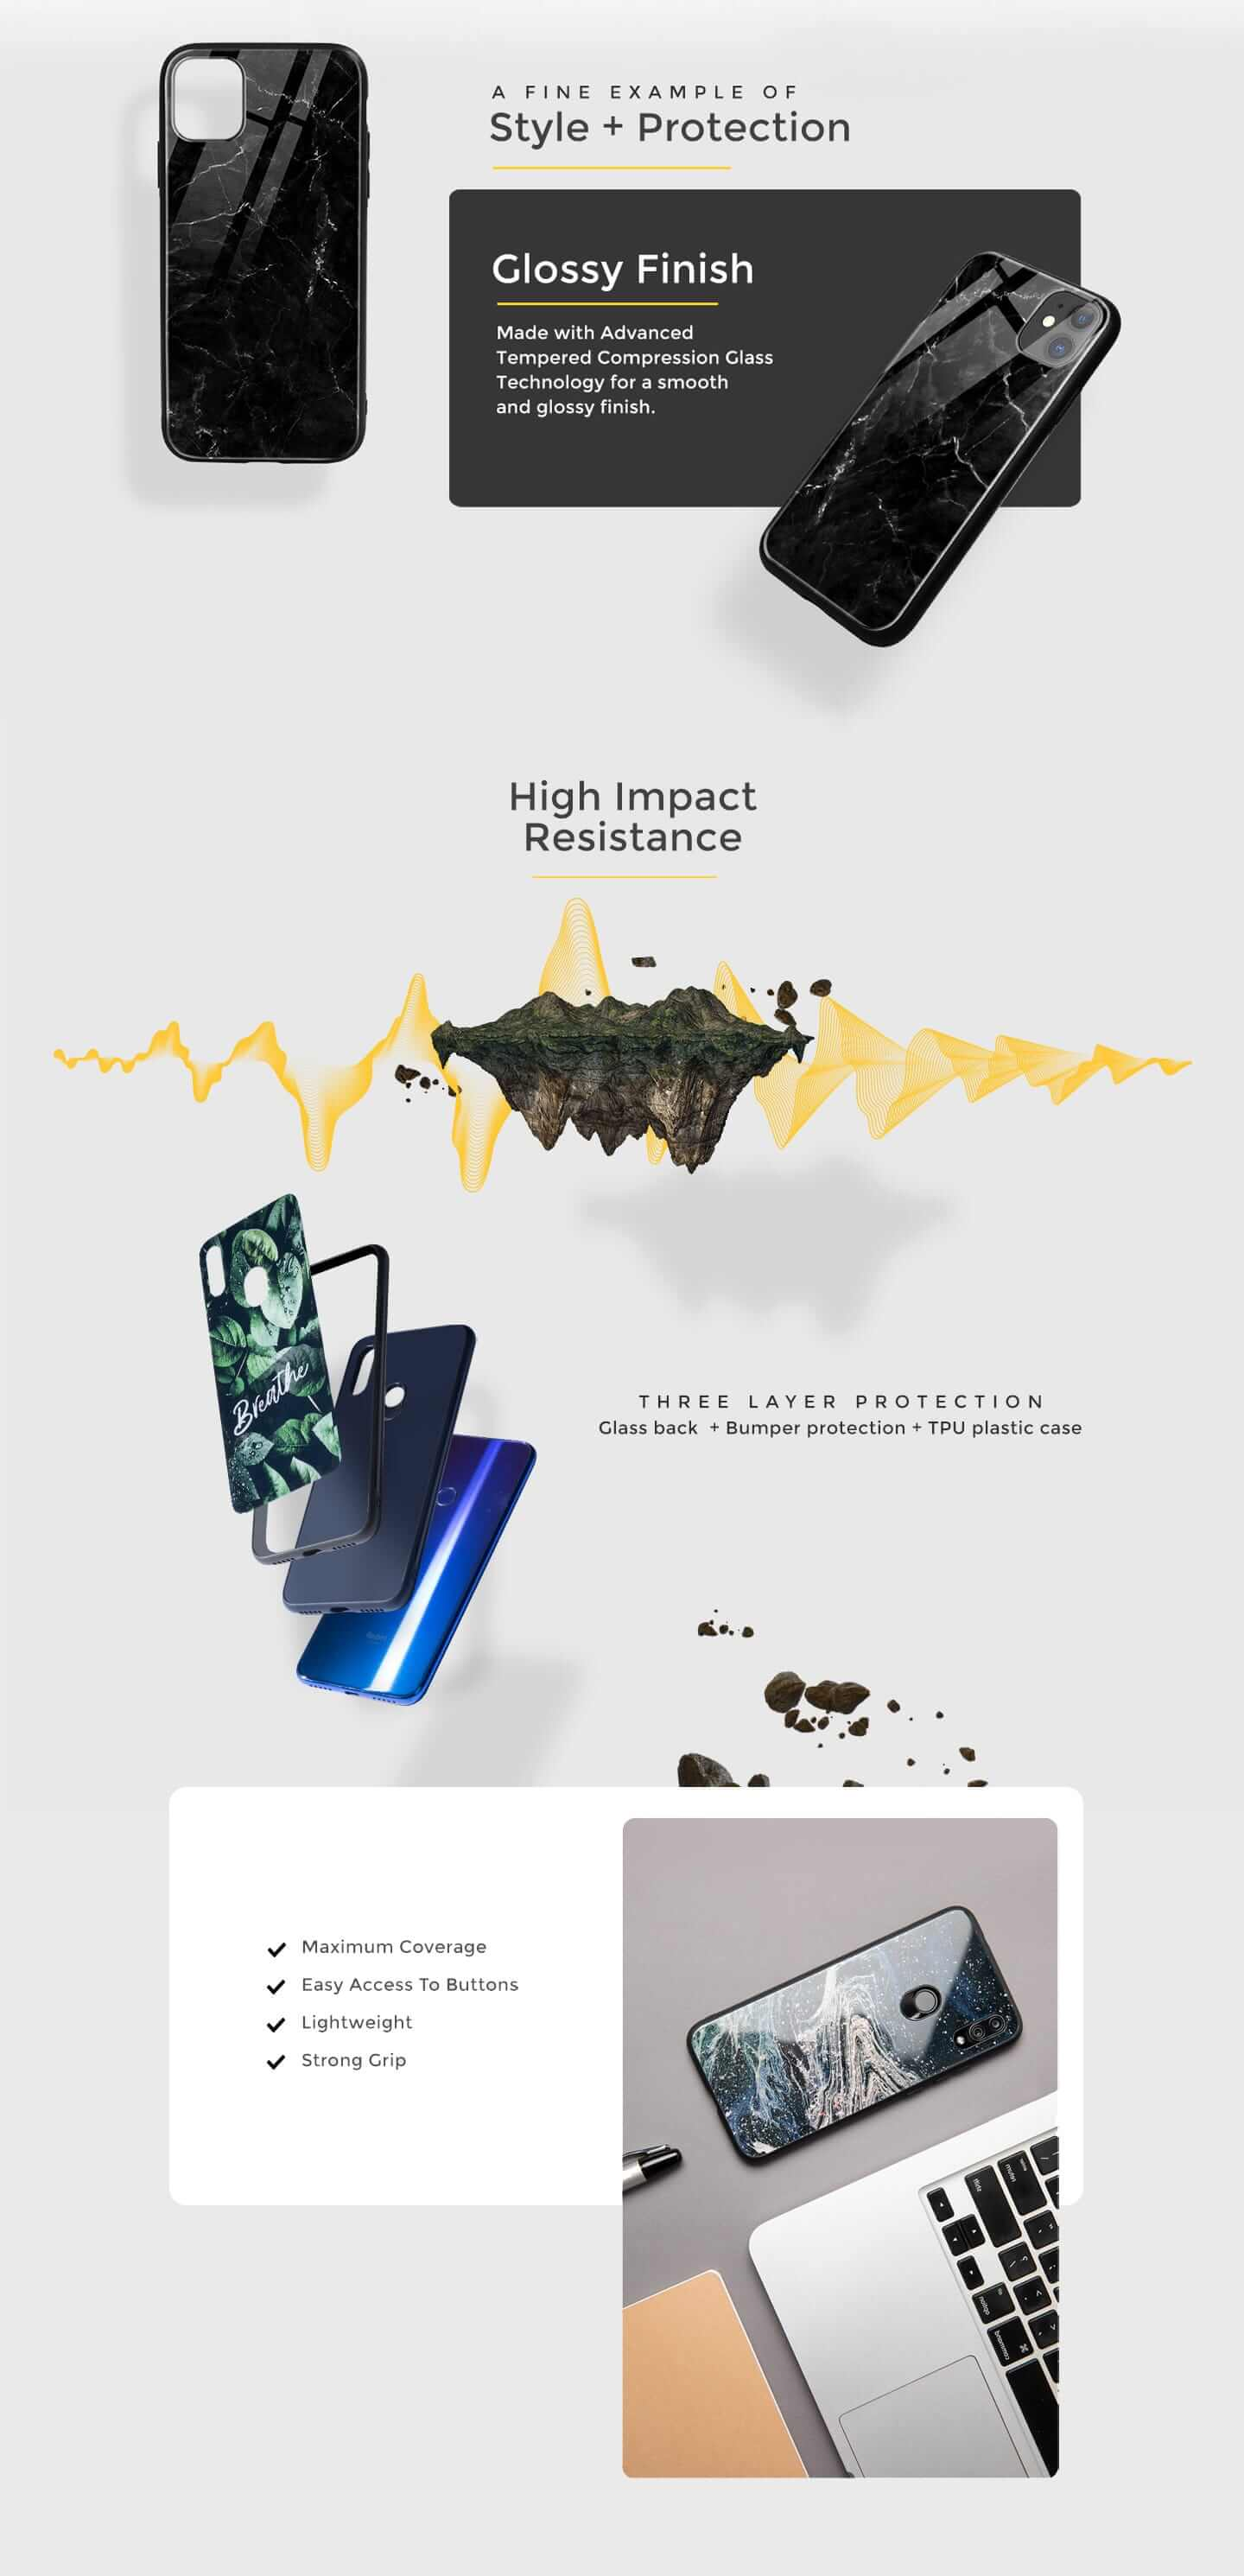 Hipster Yellow OnePlus 8 Pro Mobile Cover Description Image Website 0@Bewakoof.com